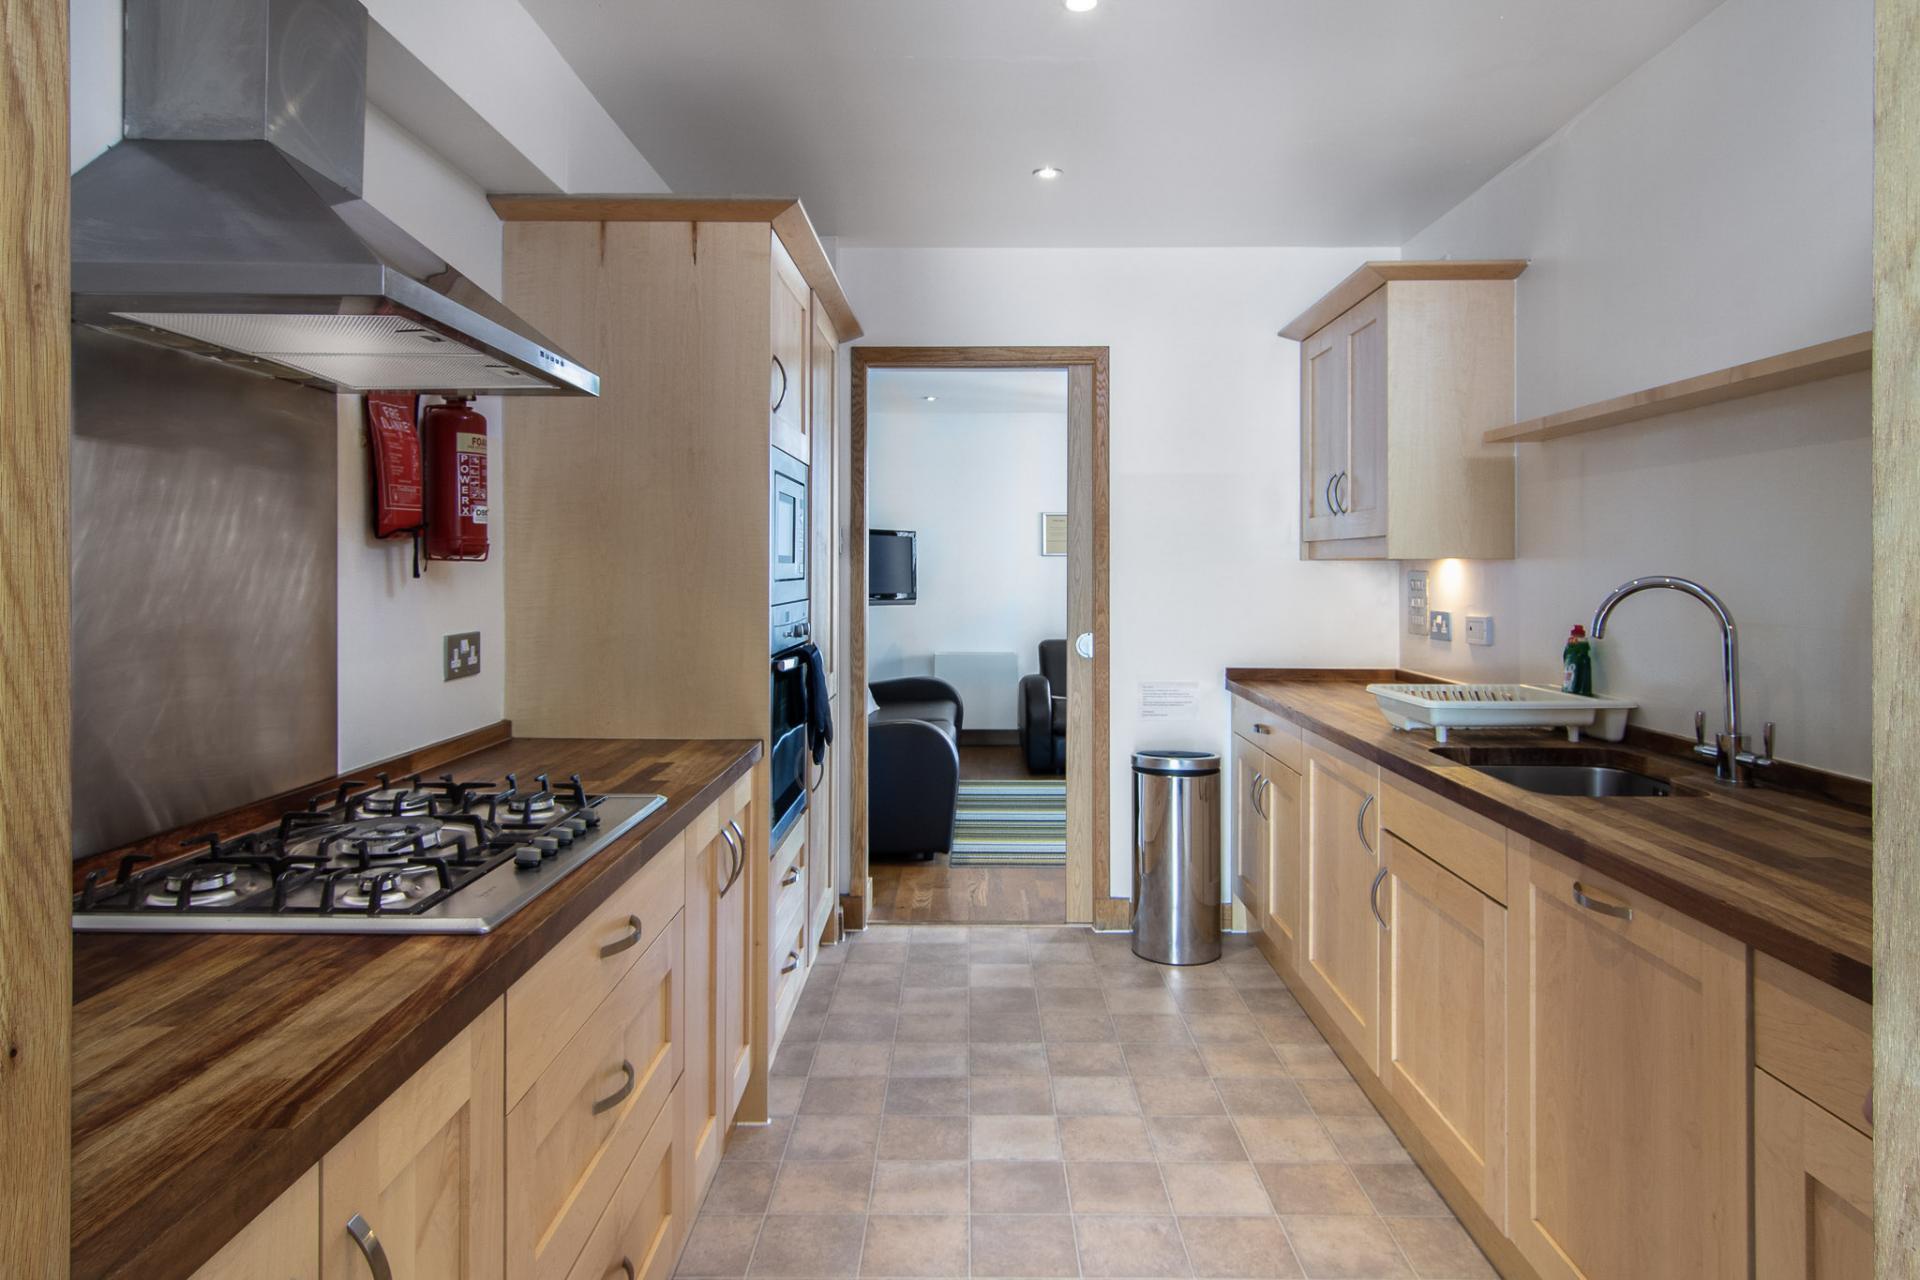 Kitchen at Staycity Edinburgh Leamington Wharf, Haymarket, Edinburgh